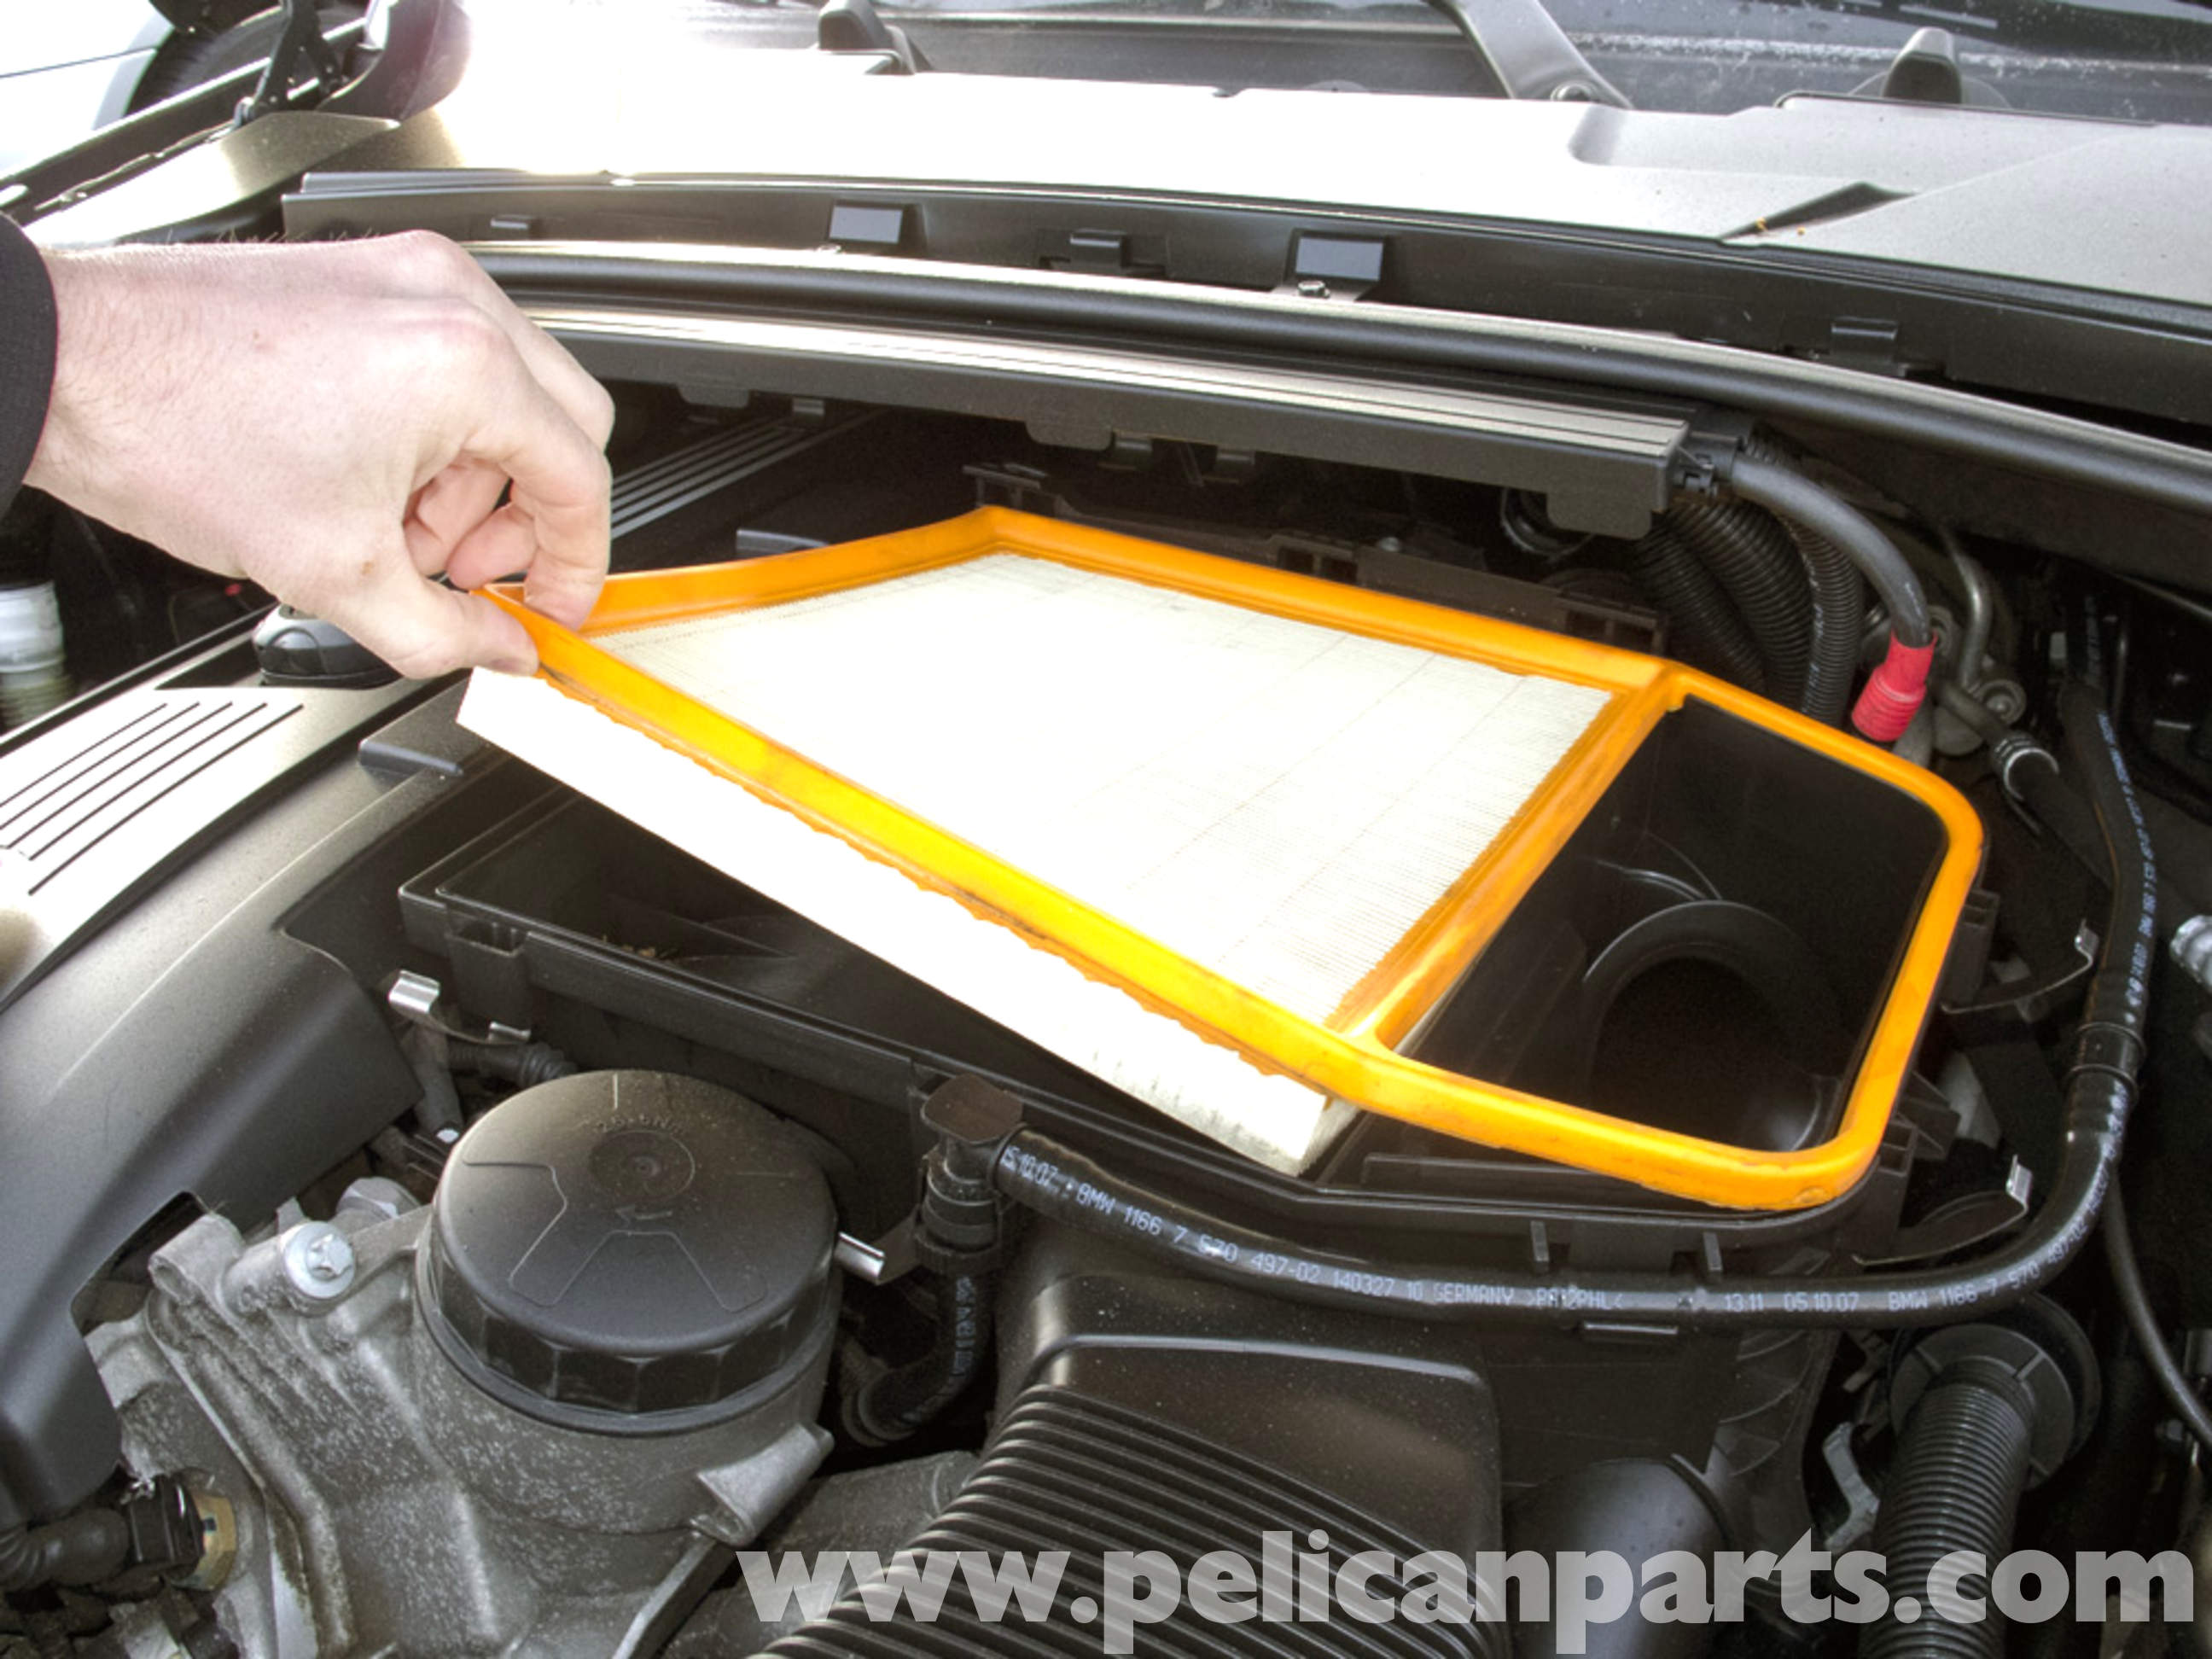 Bmw E90 Air Filter Replacement E91 E92 E93 Pelican Parts Diy Maintenance Article